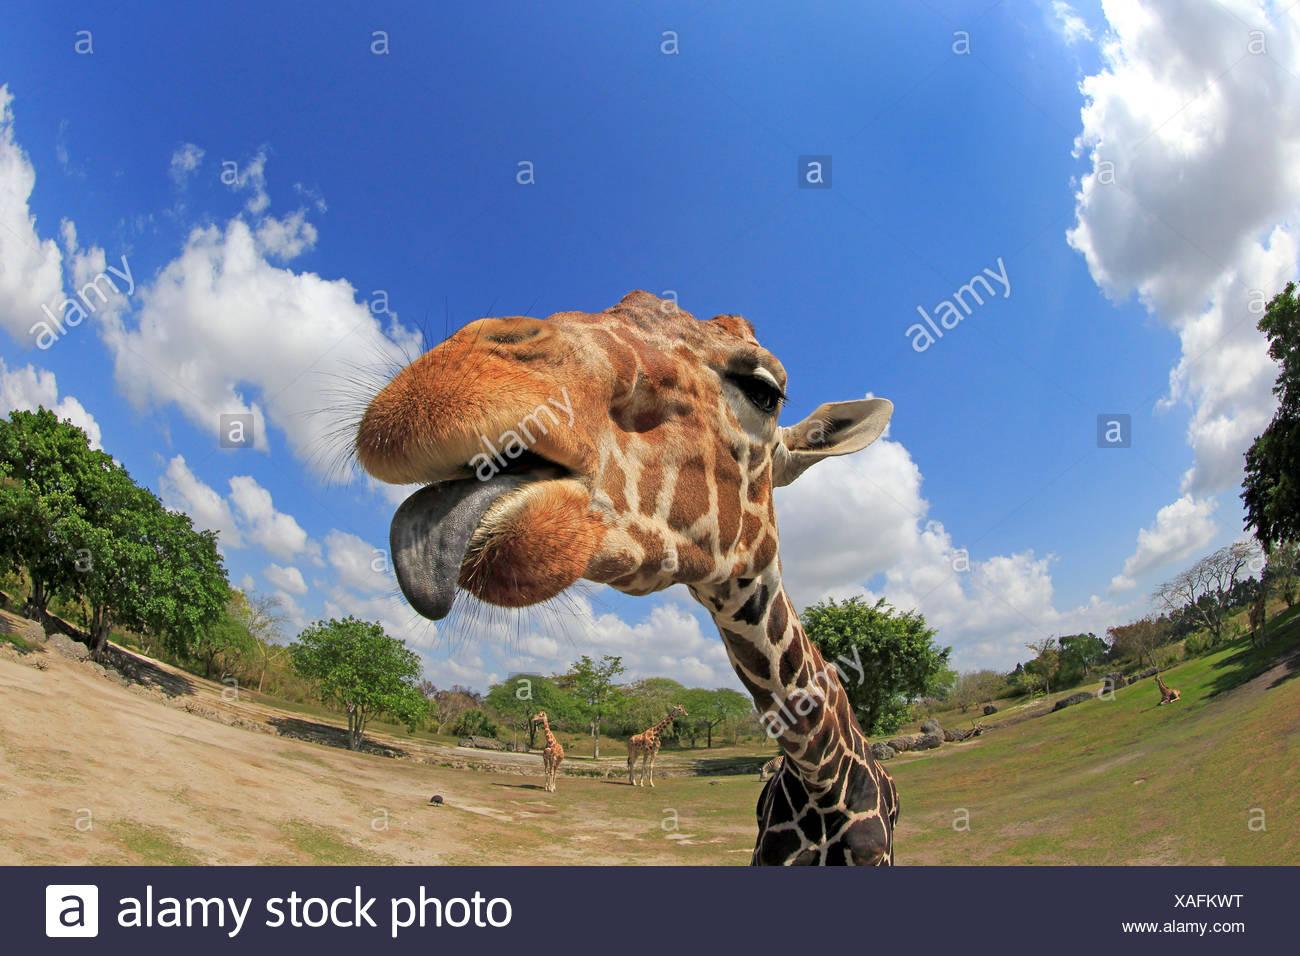 Reticulated Giraffe, adult portrait, Africa / (Giraffa camelopardalis reticulata) - Stock Image